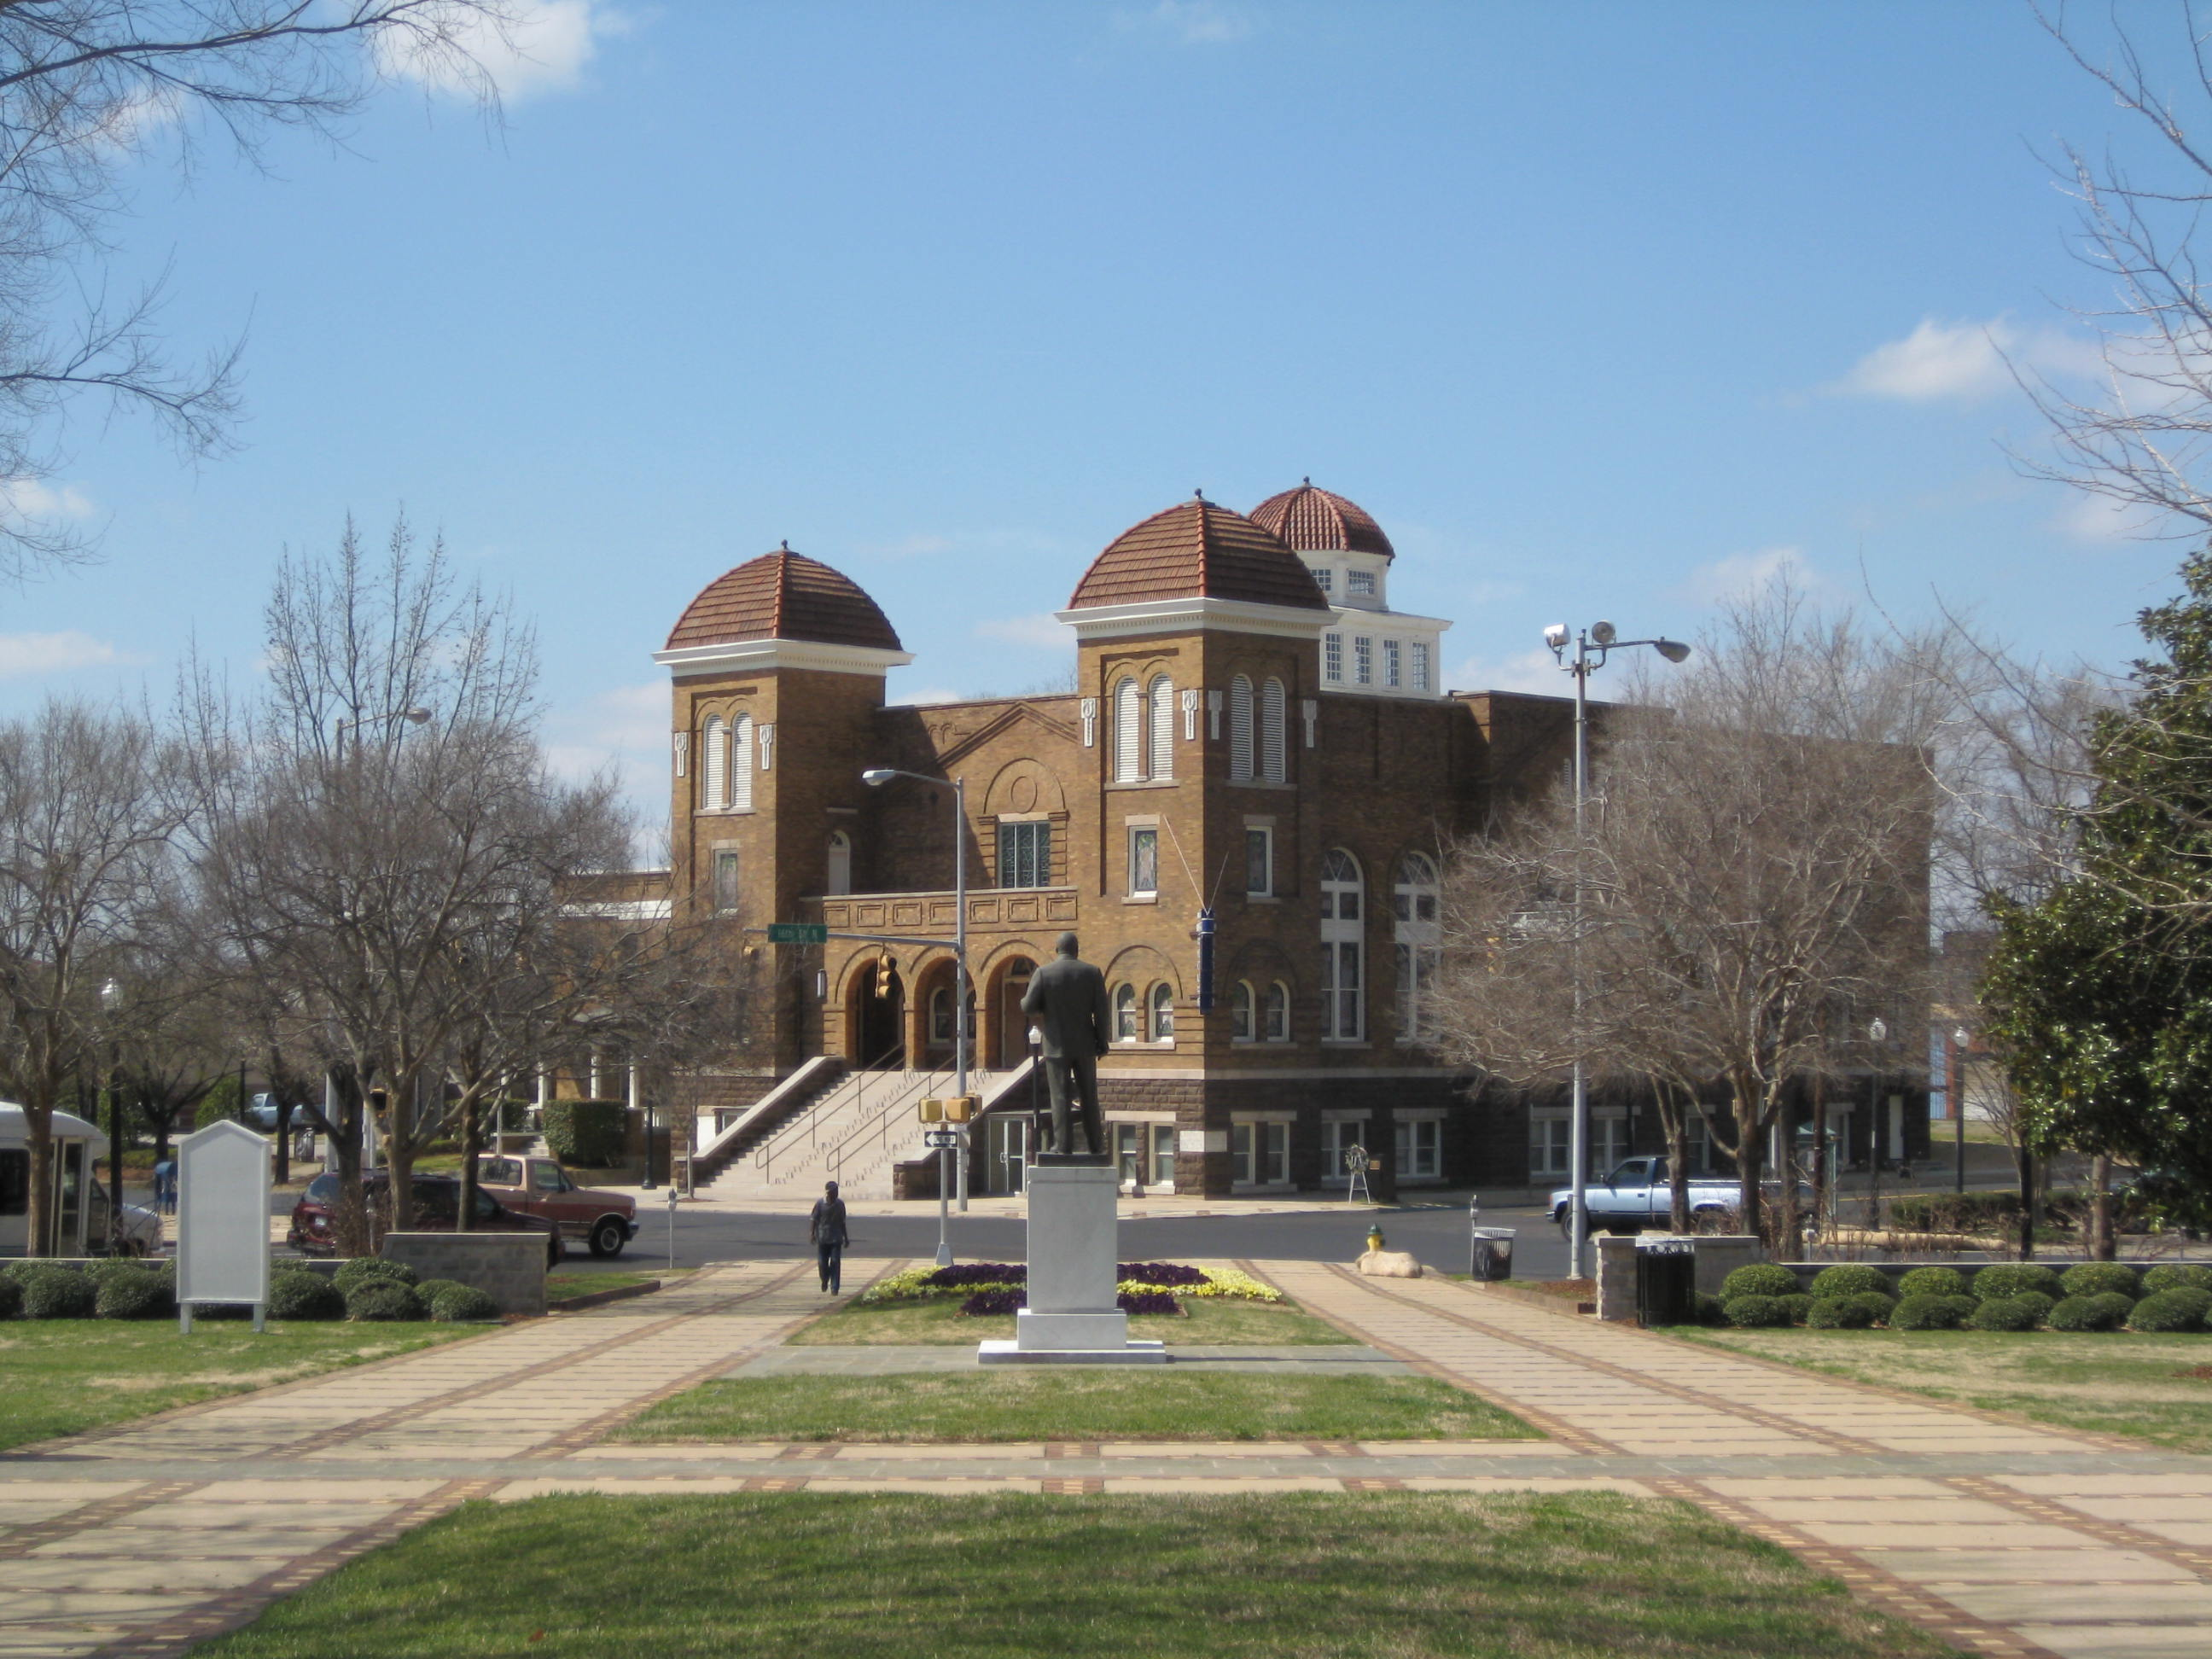 16th Street Baptist Church in Birmingham, AL